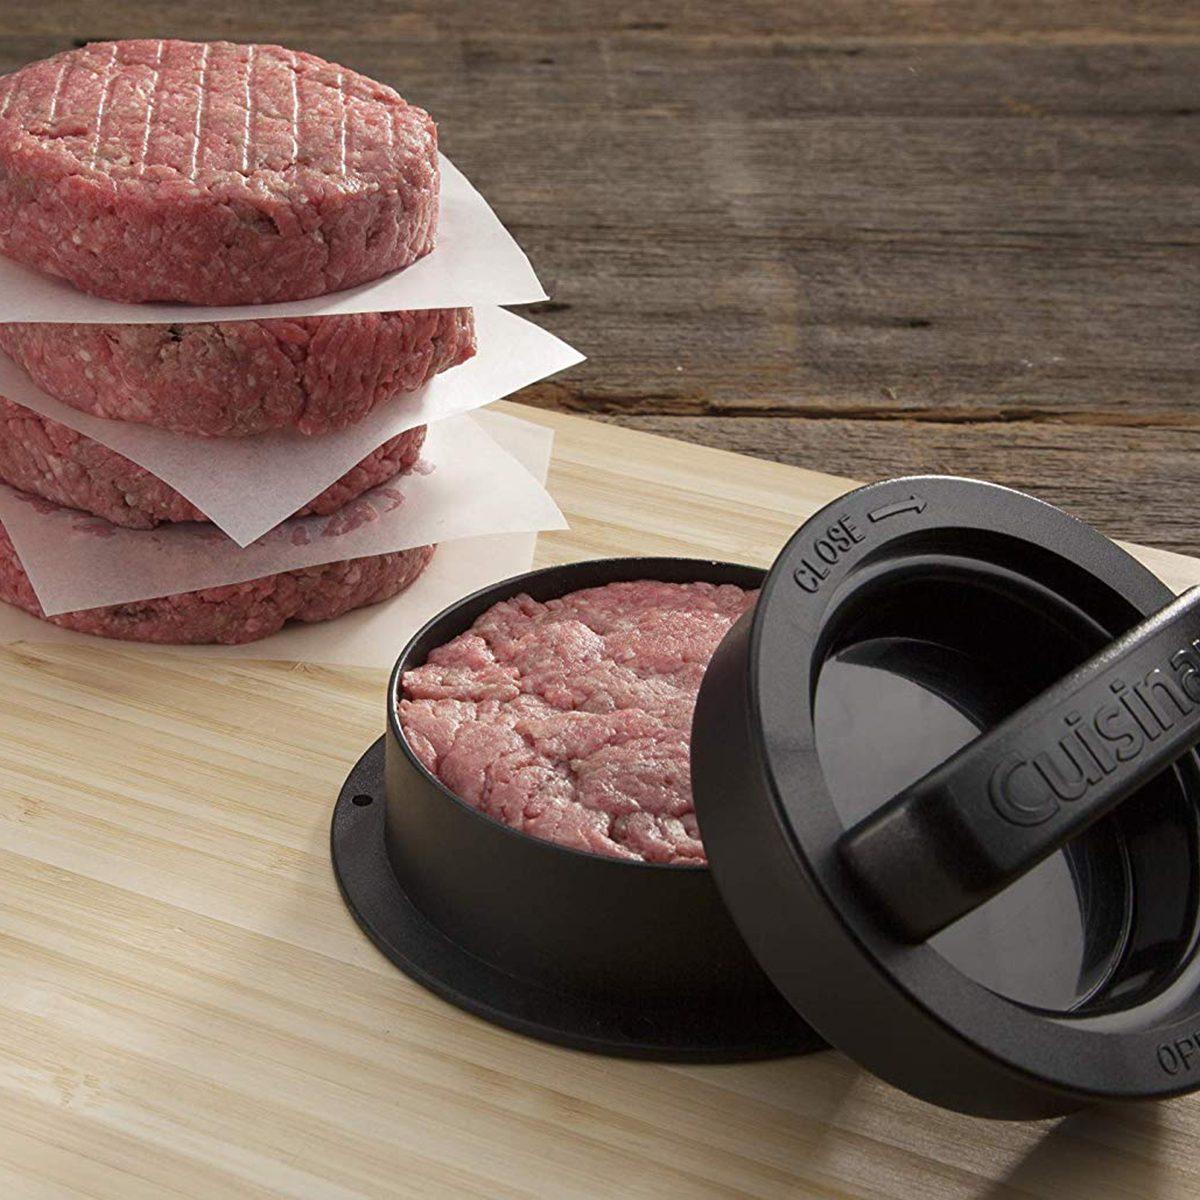 Cuisinart CSBP-100 3-in-1 Stuffed Burger Press, Black